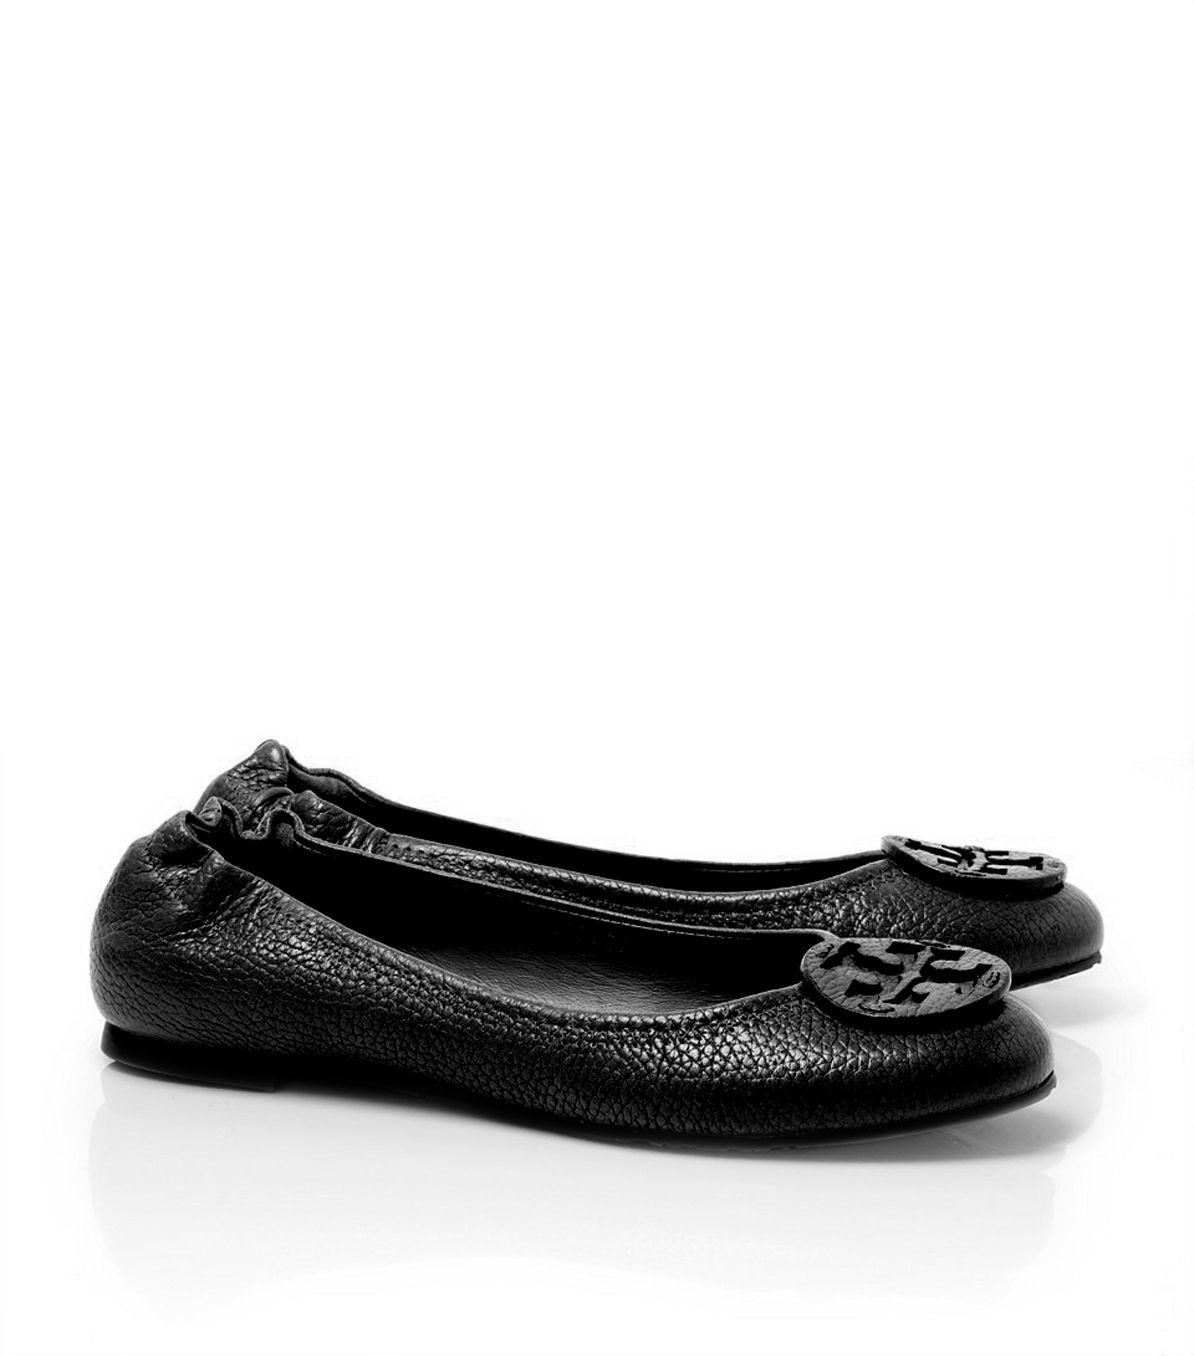 8d2289c367212 Lyst - Tory Burch Tumbled Leather Reva Ballet Flat in Black